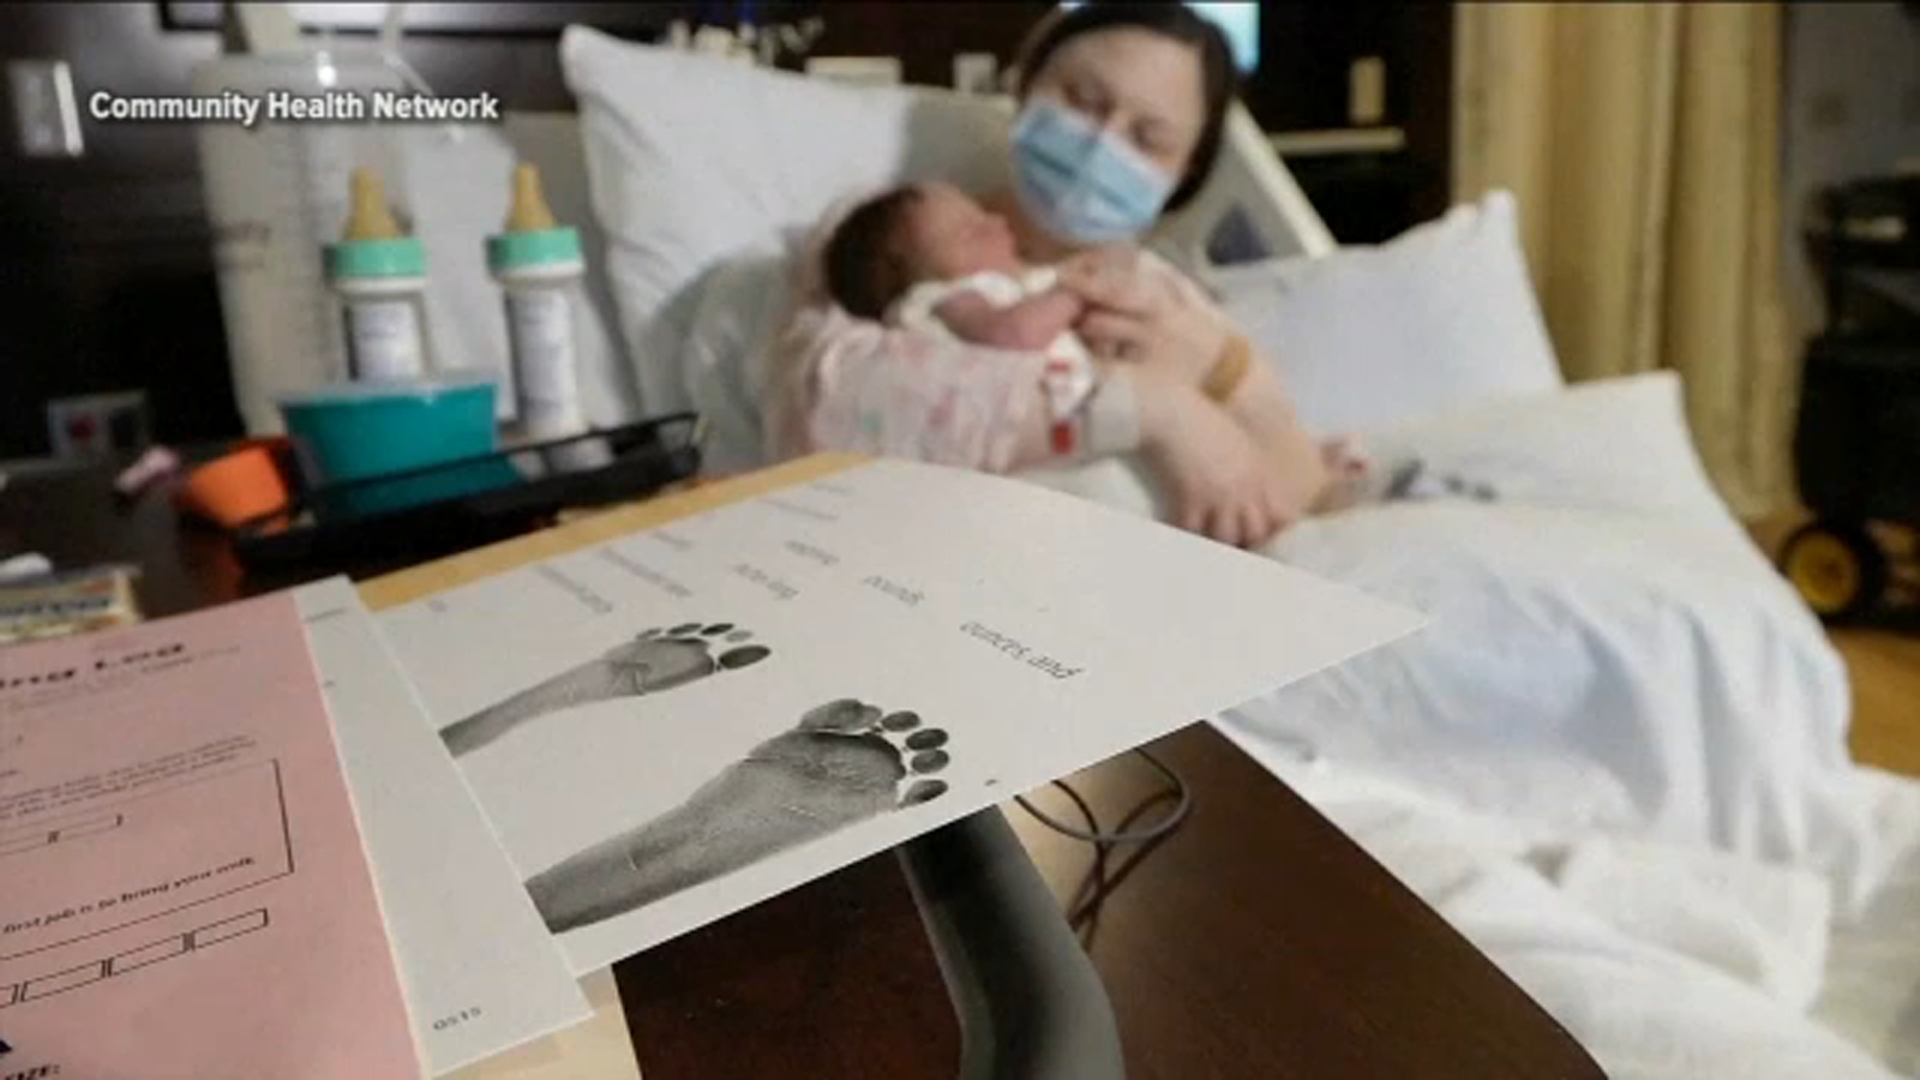 Baby boom resulting from coronavirus pandemic quarantine, hospital finds